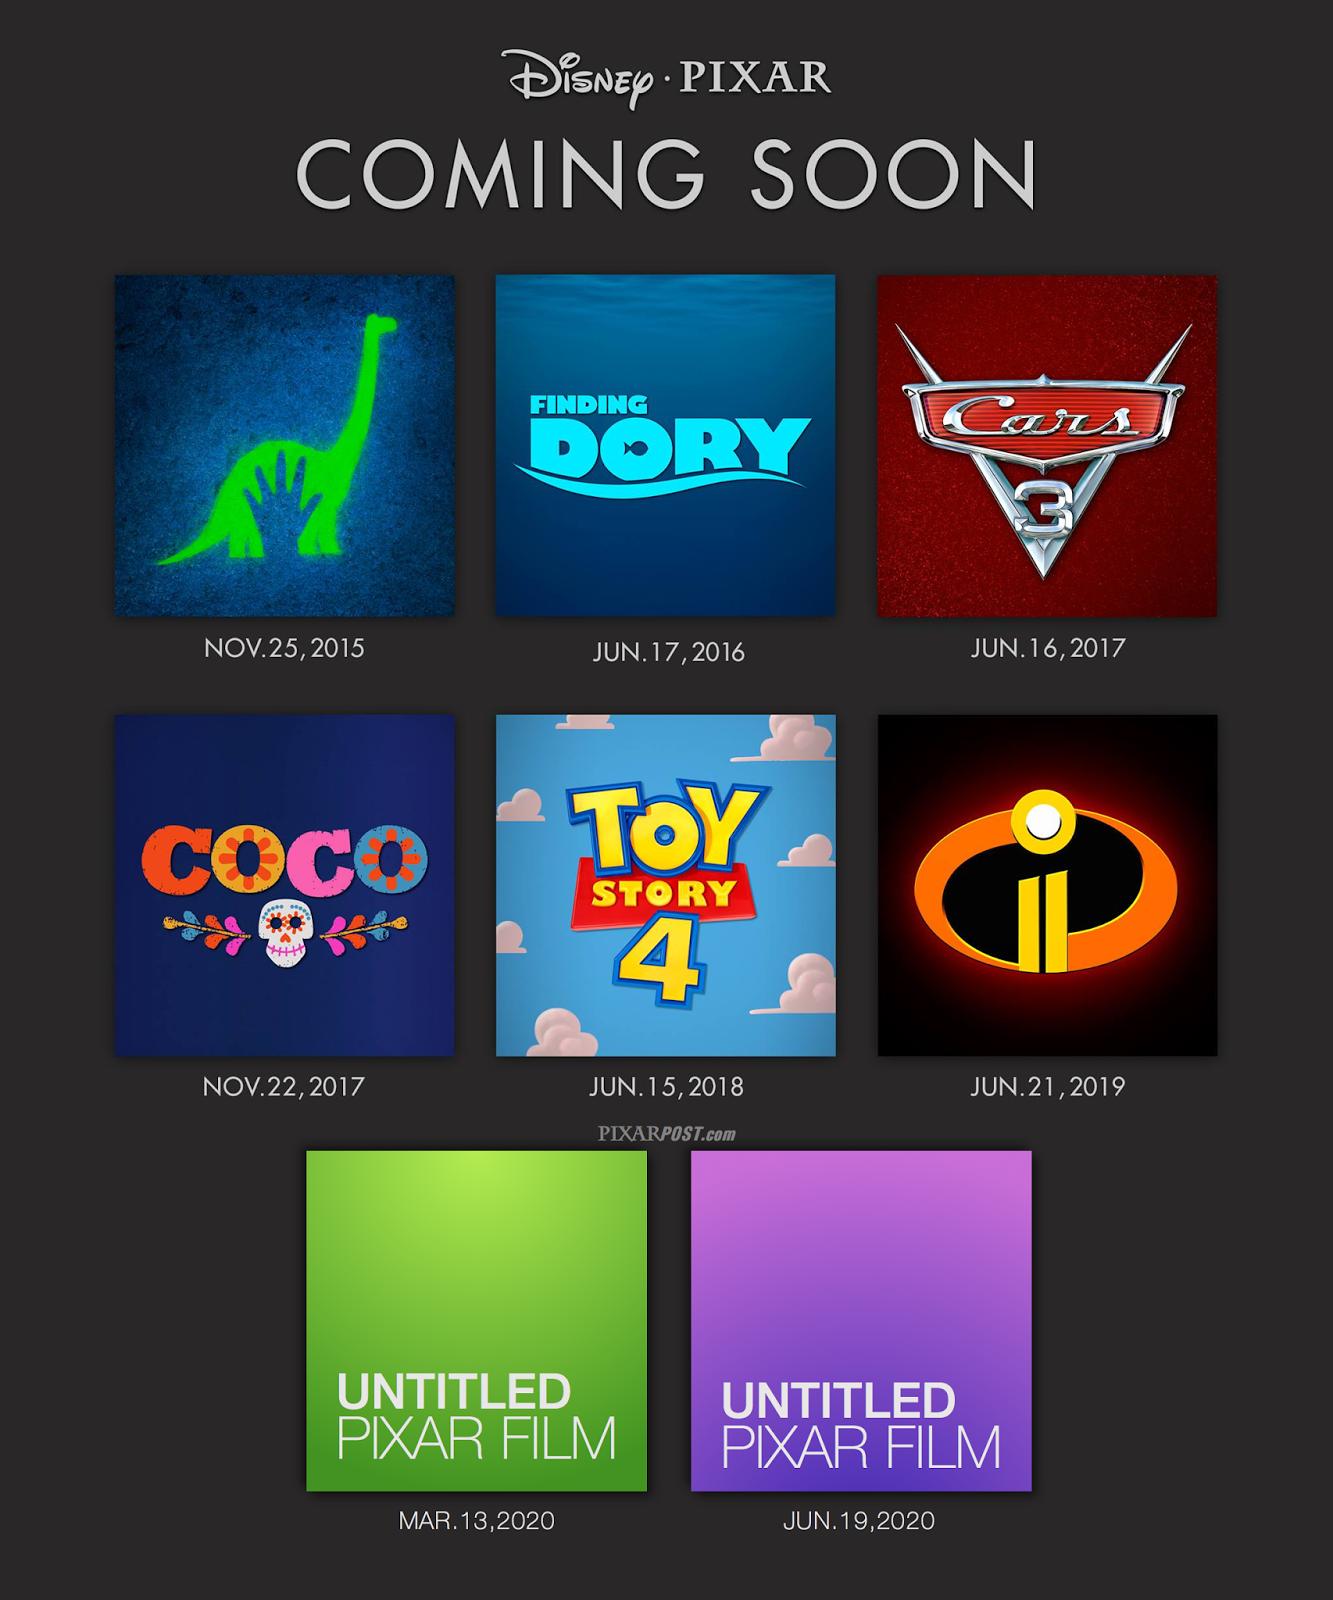 pair of untitled pixar films coming in 2020 pixar post